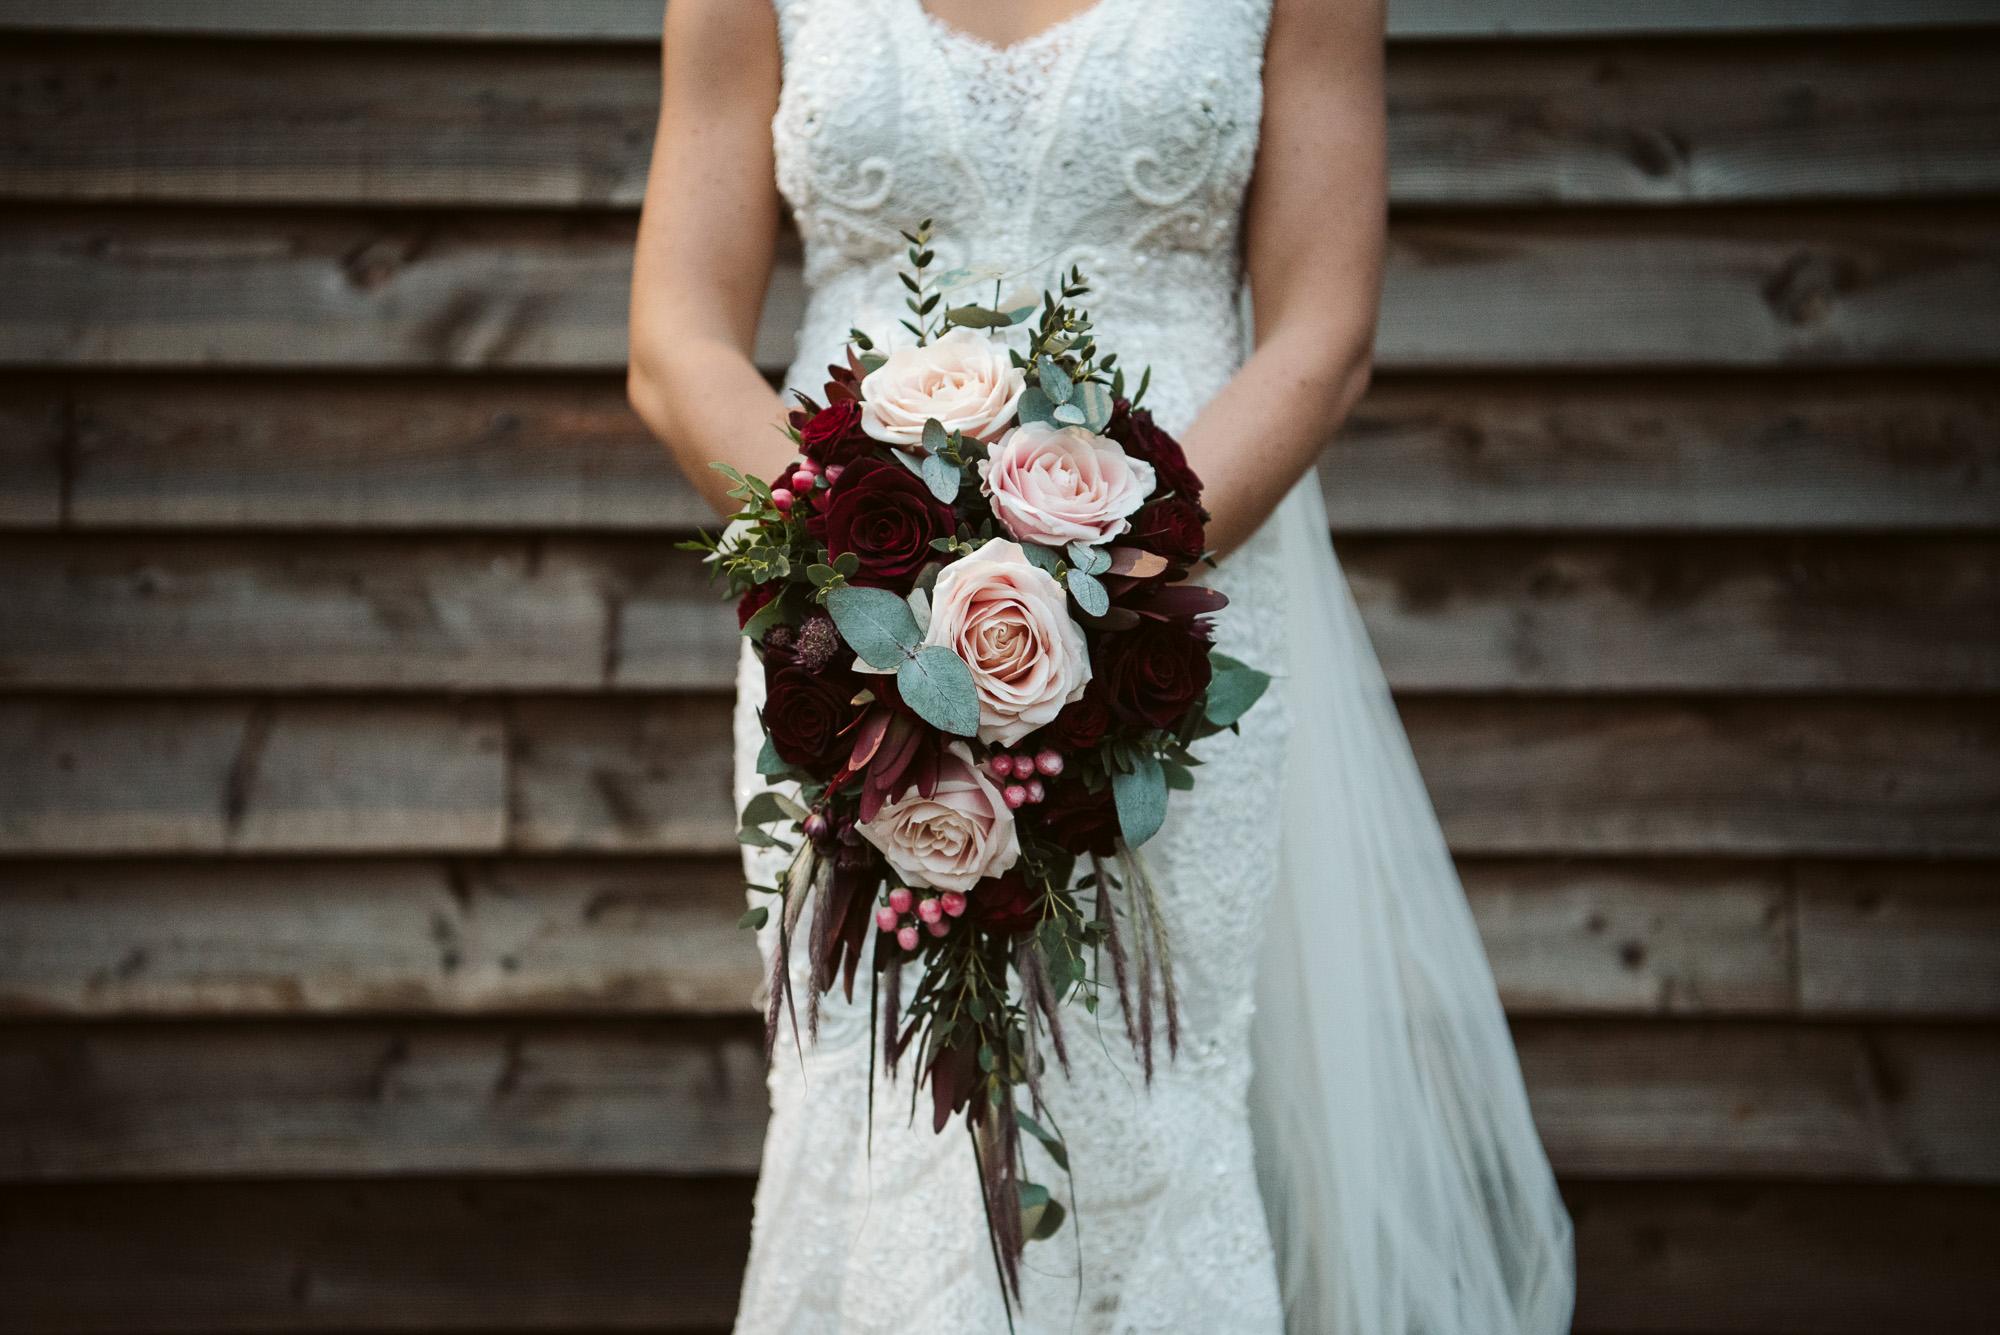 The Mill Barns Wedding Photographer Shropshire (32 of 40).jpg